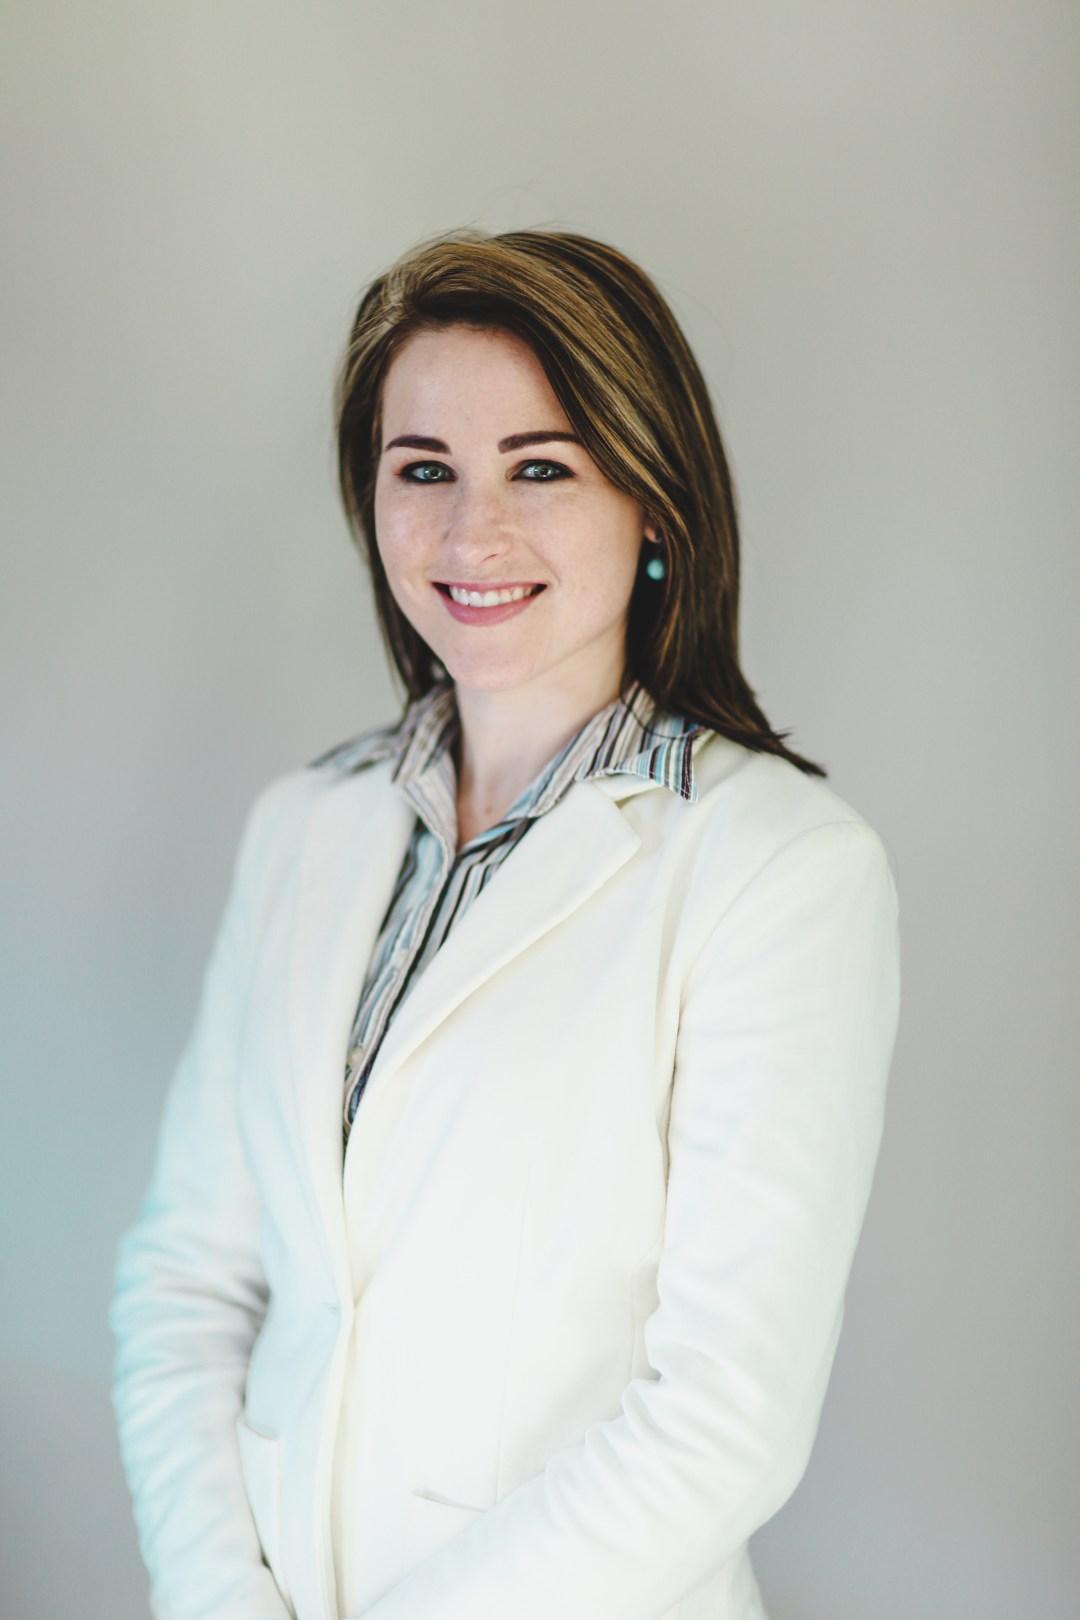 Michelle Nagel